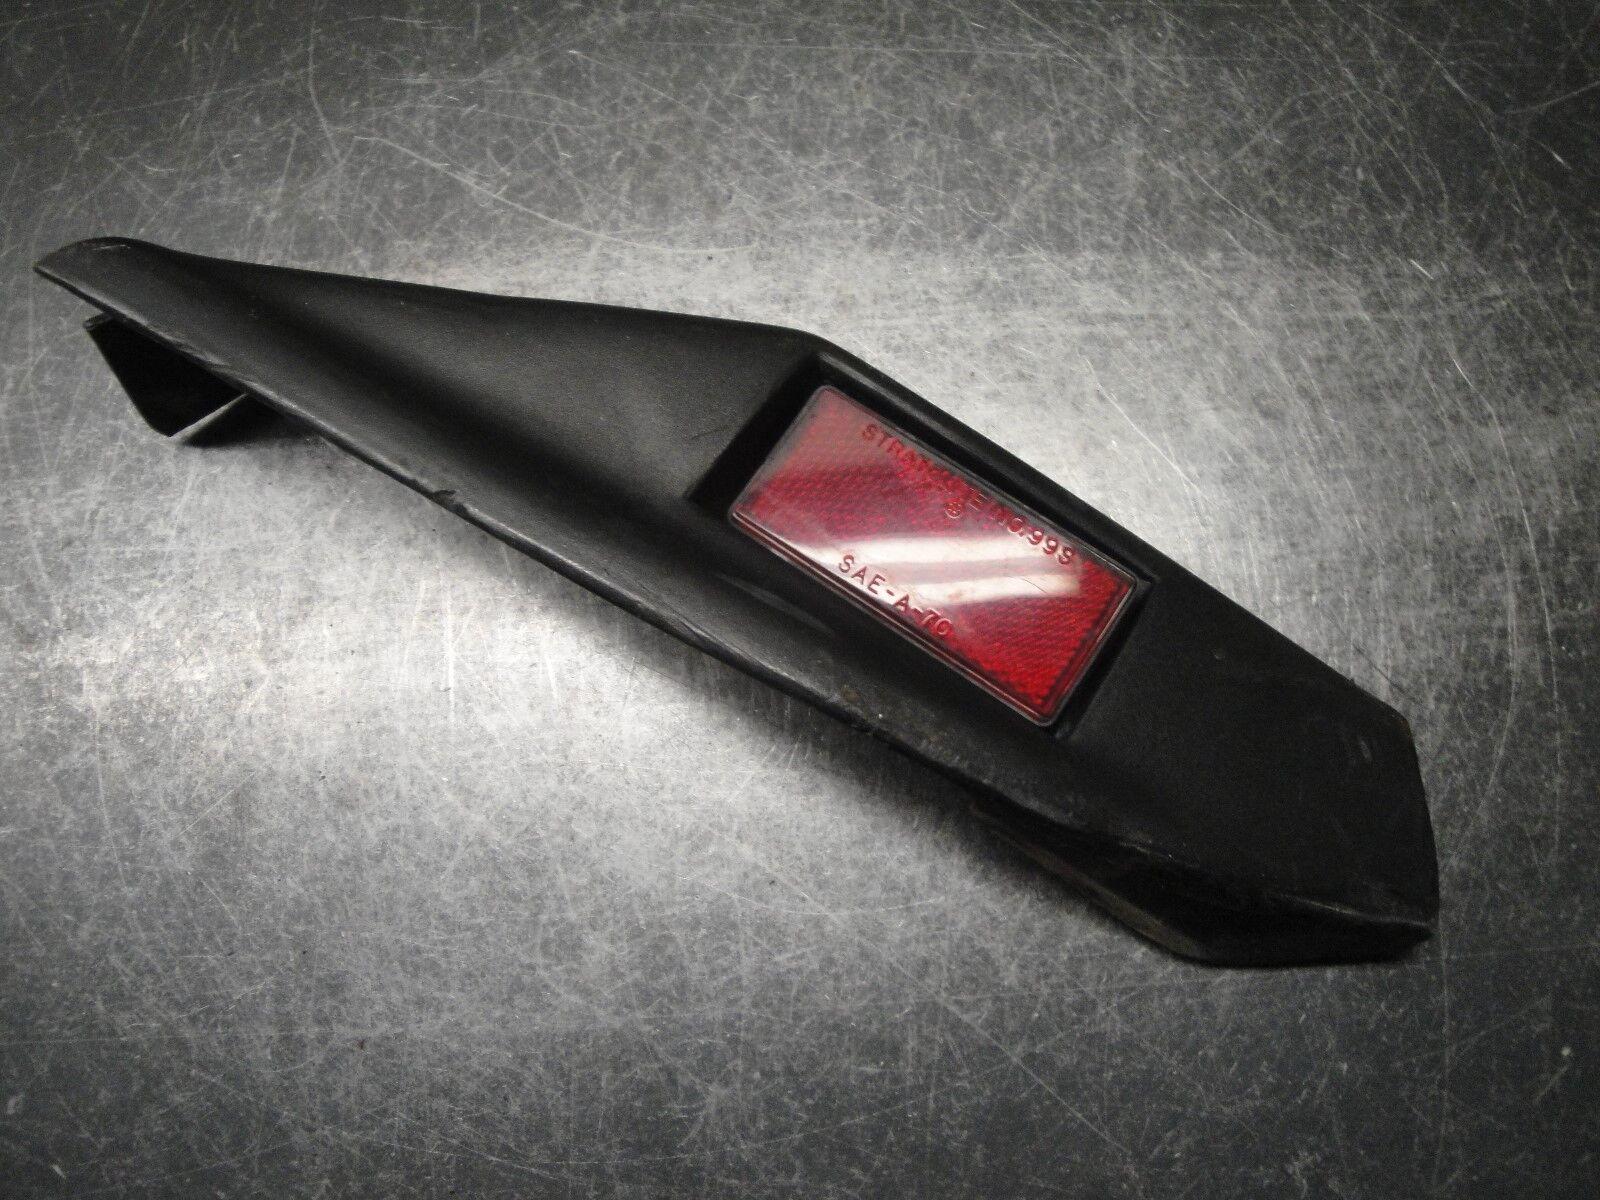 1998 '98 SKIDOO SKI-DOO 670 X SUMMIT SNOWMOBILE BODY PLASTIC PANEL REFLECTOR